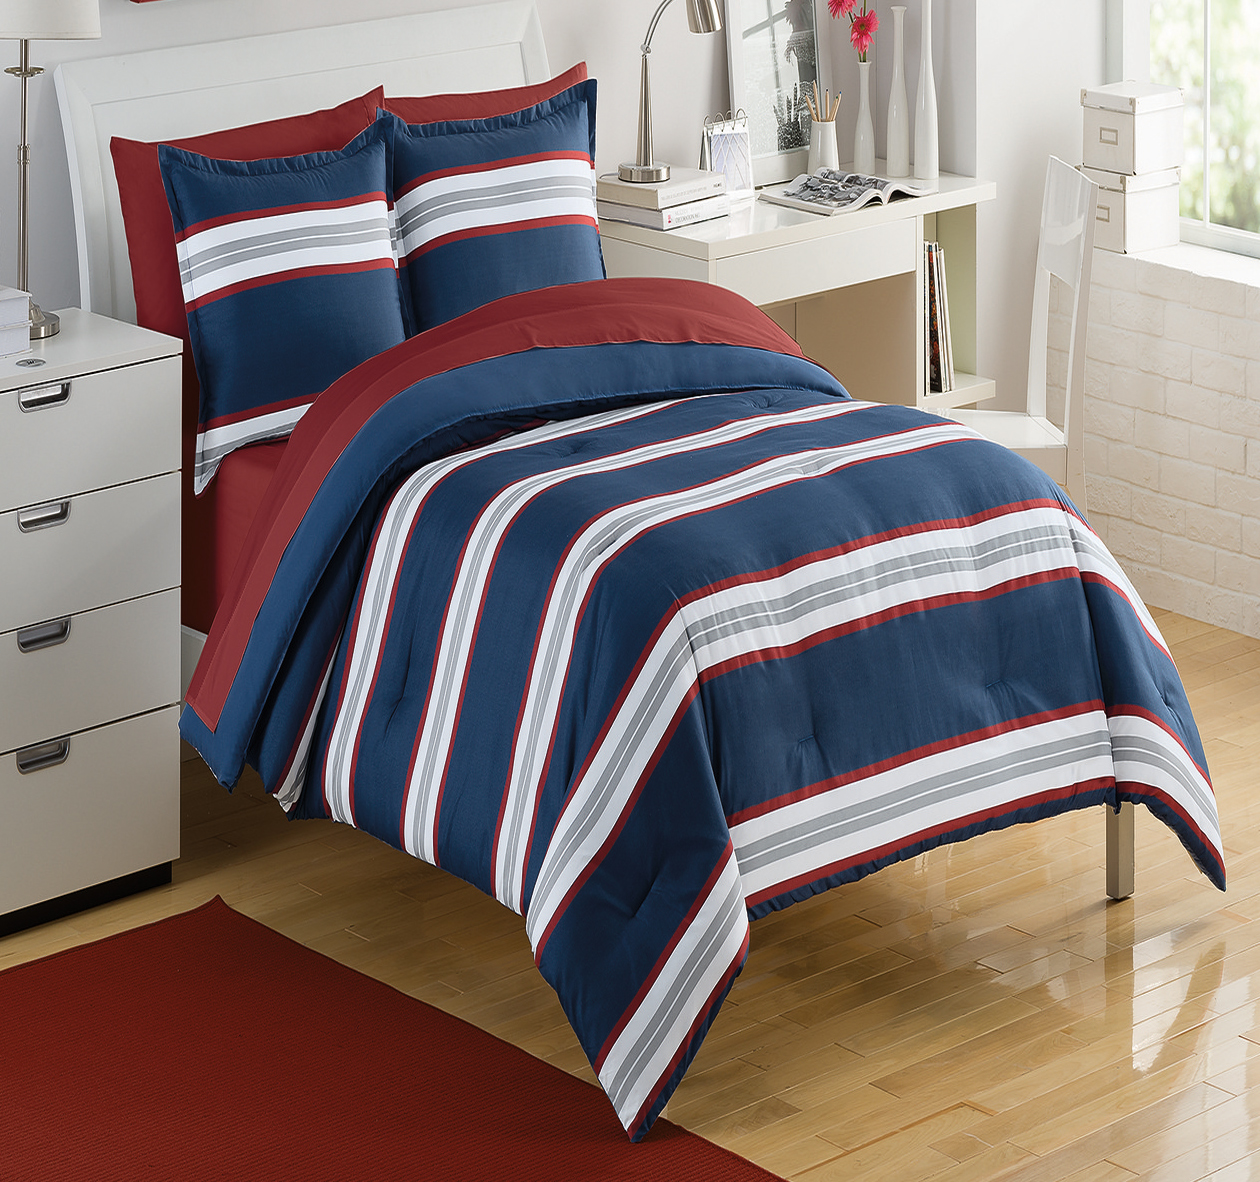 Rugby Stripe Navy Red By Izod Bedding Beddingsuperstore Com